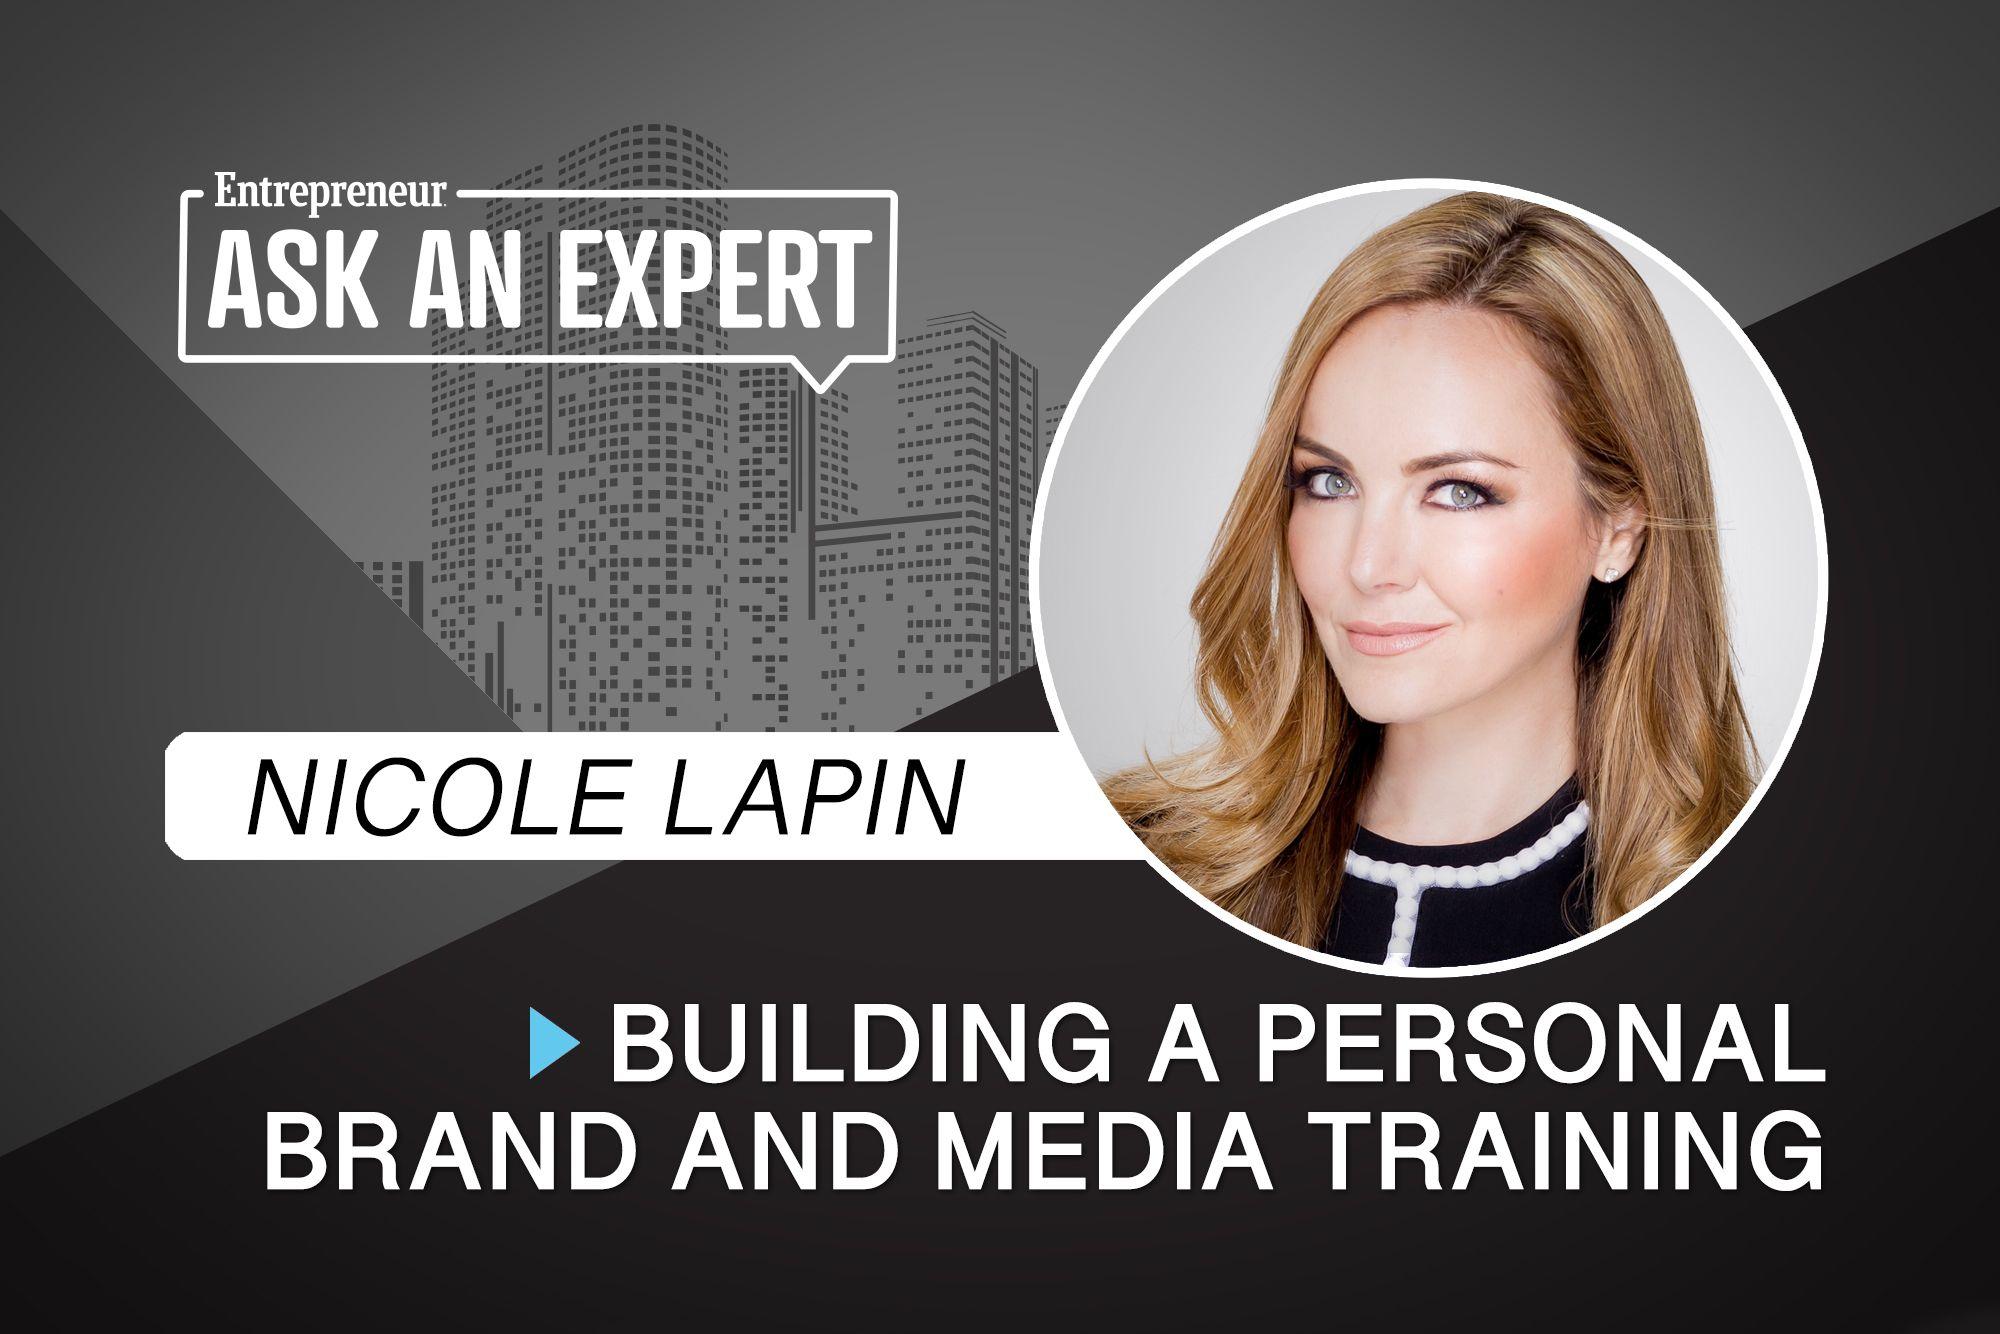 20190308070809-Ask-an-Expert-Nicole-Lapin.jpg